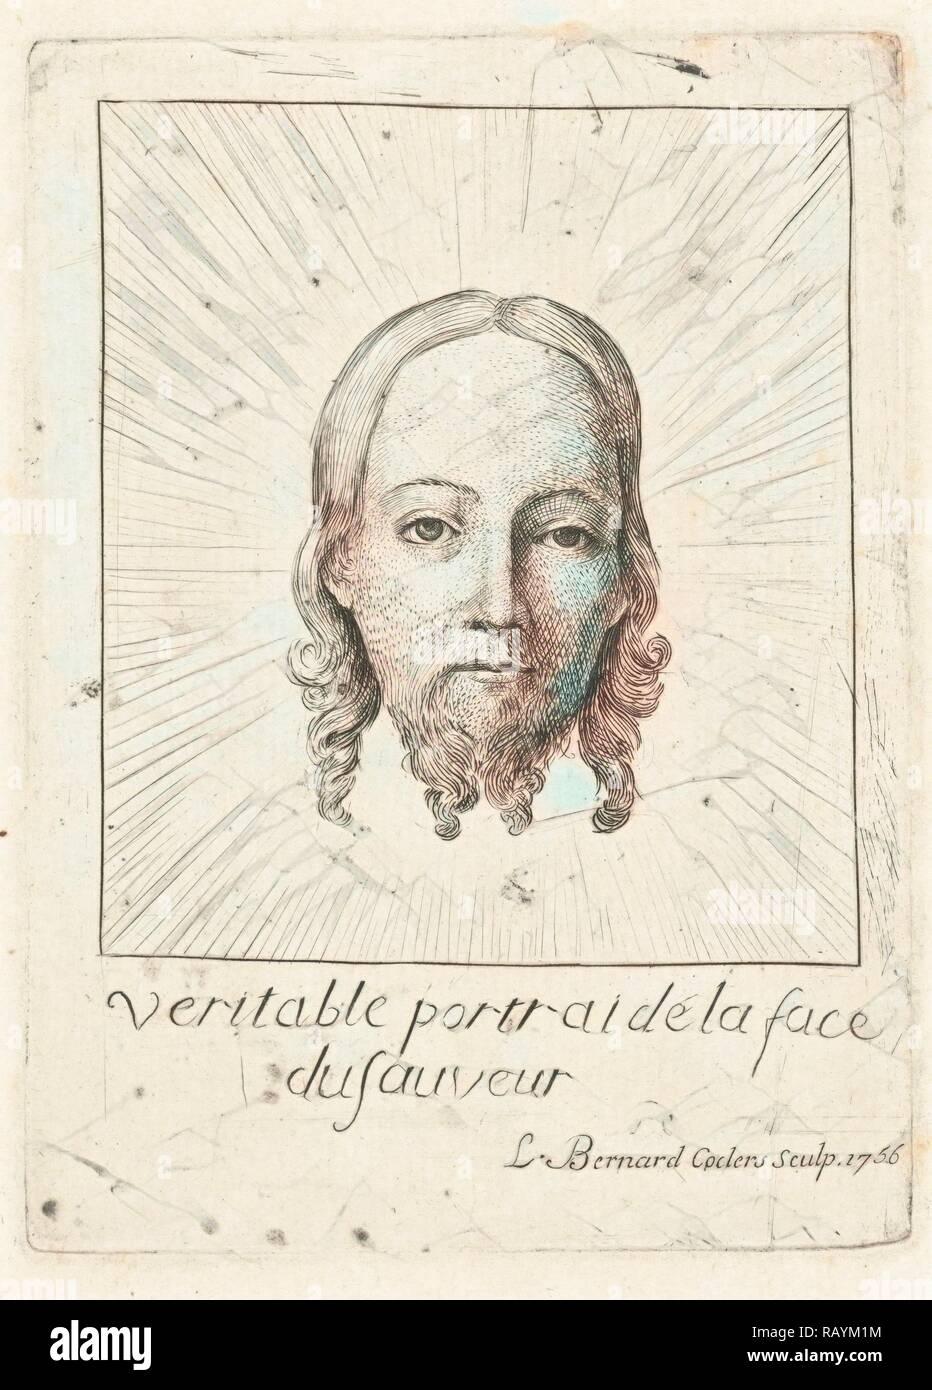 Kopf des Christus in Herrlichkeit, drucken Teekocher: Louis Bernard Coclers, Jan van Eyck, 1756. Neuerfundene Stockbild